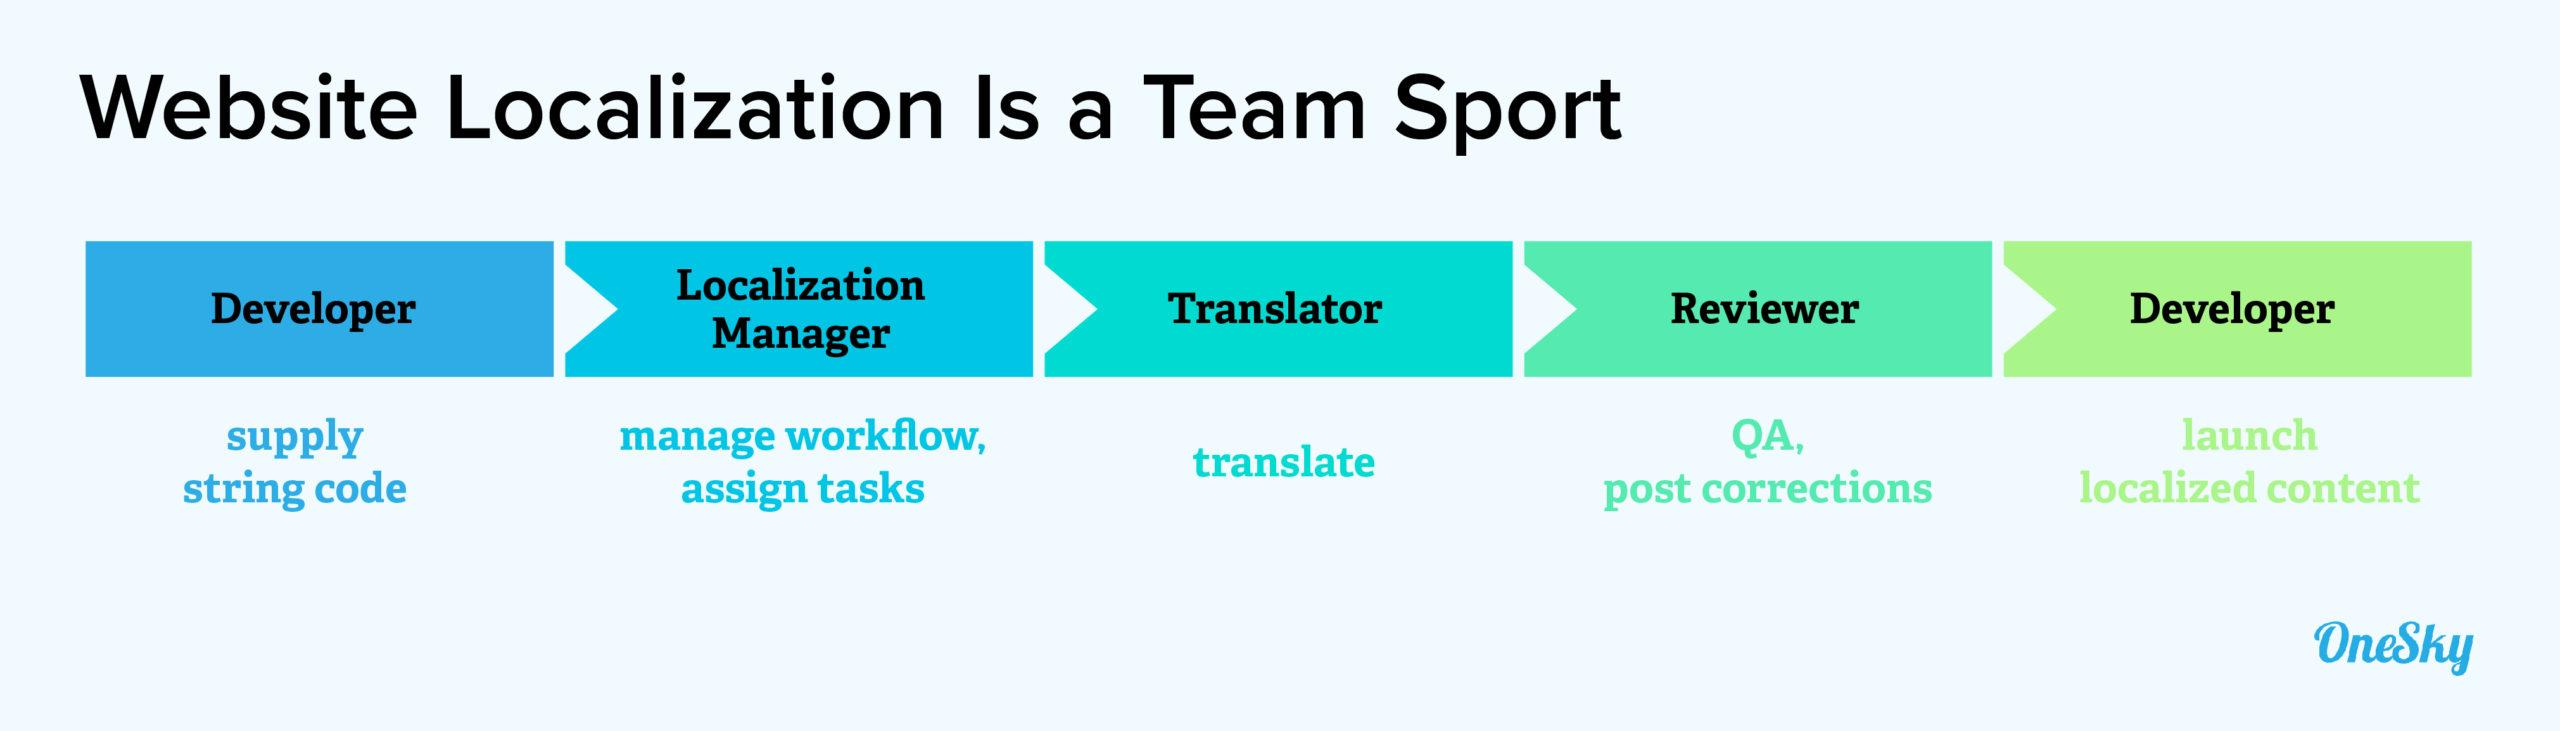 website localization is a team sport